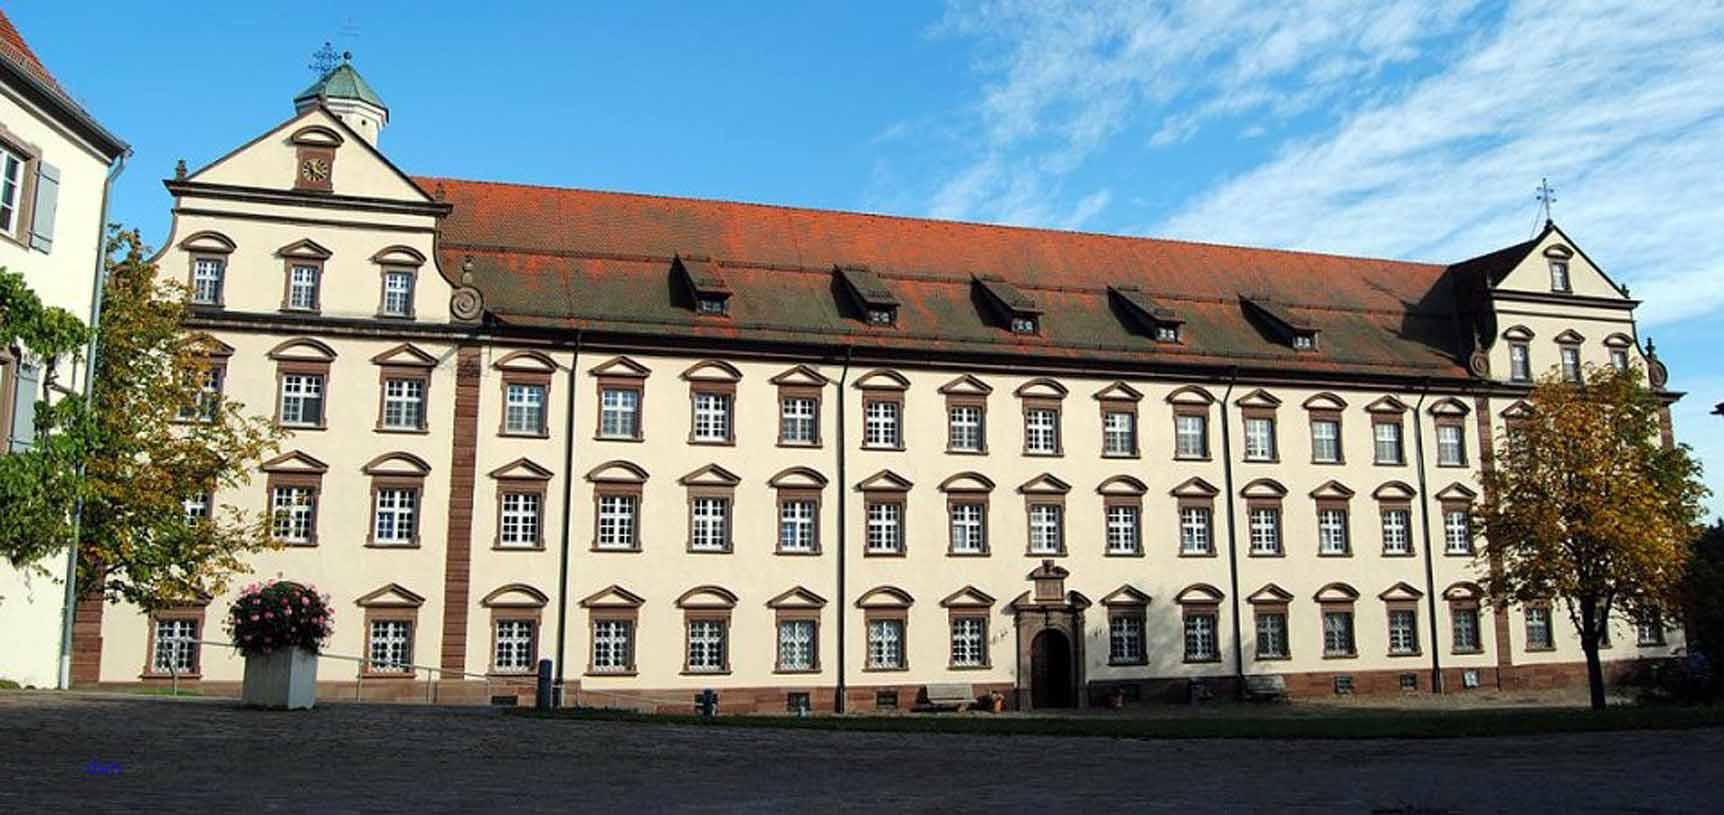 Kloster Kirchbergkirchbergbernst12_29-958x453